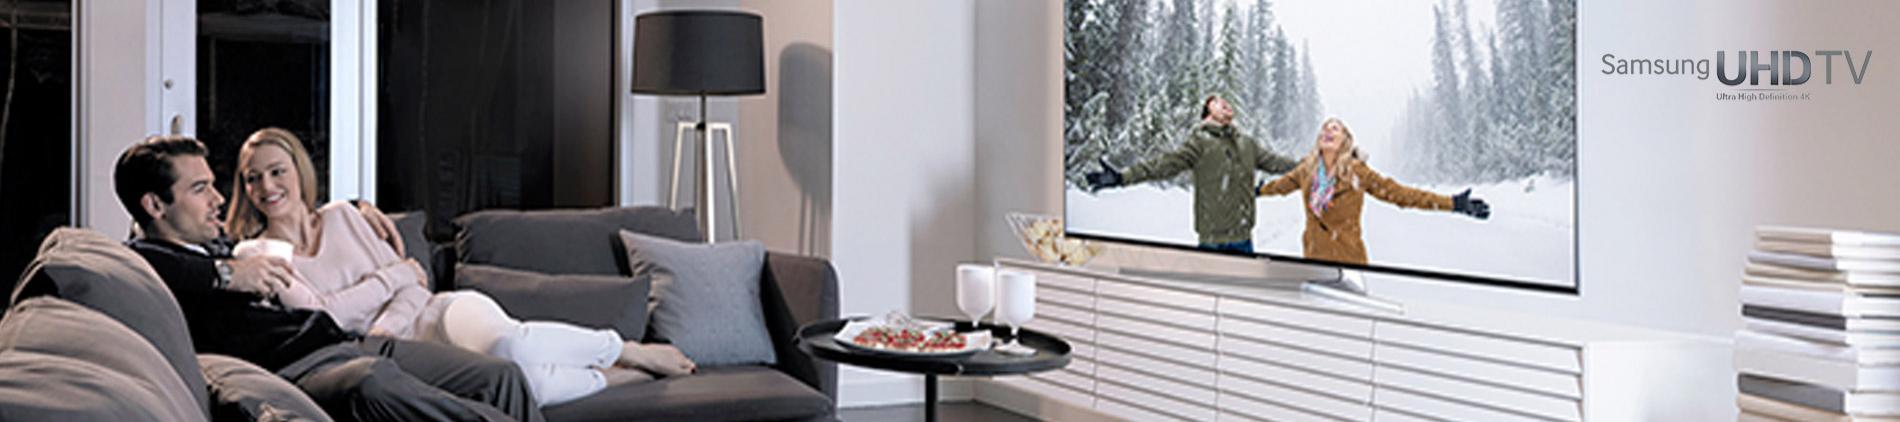 Samsung 4K UHD TV